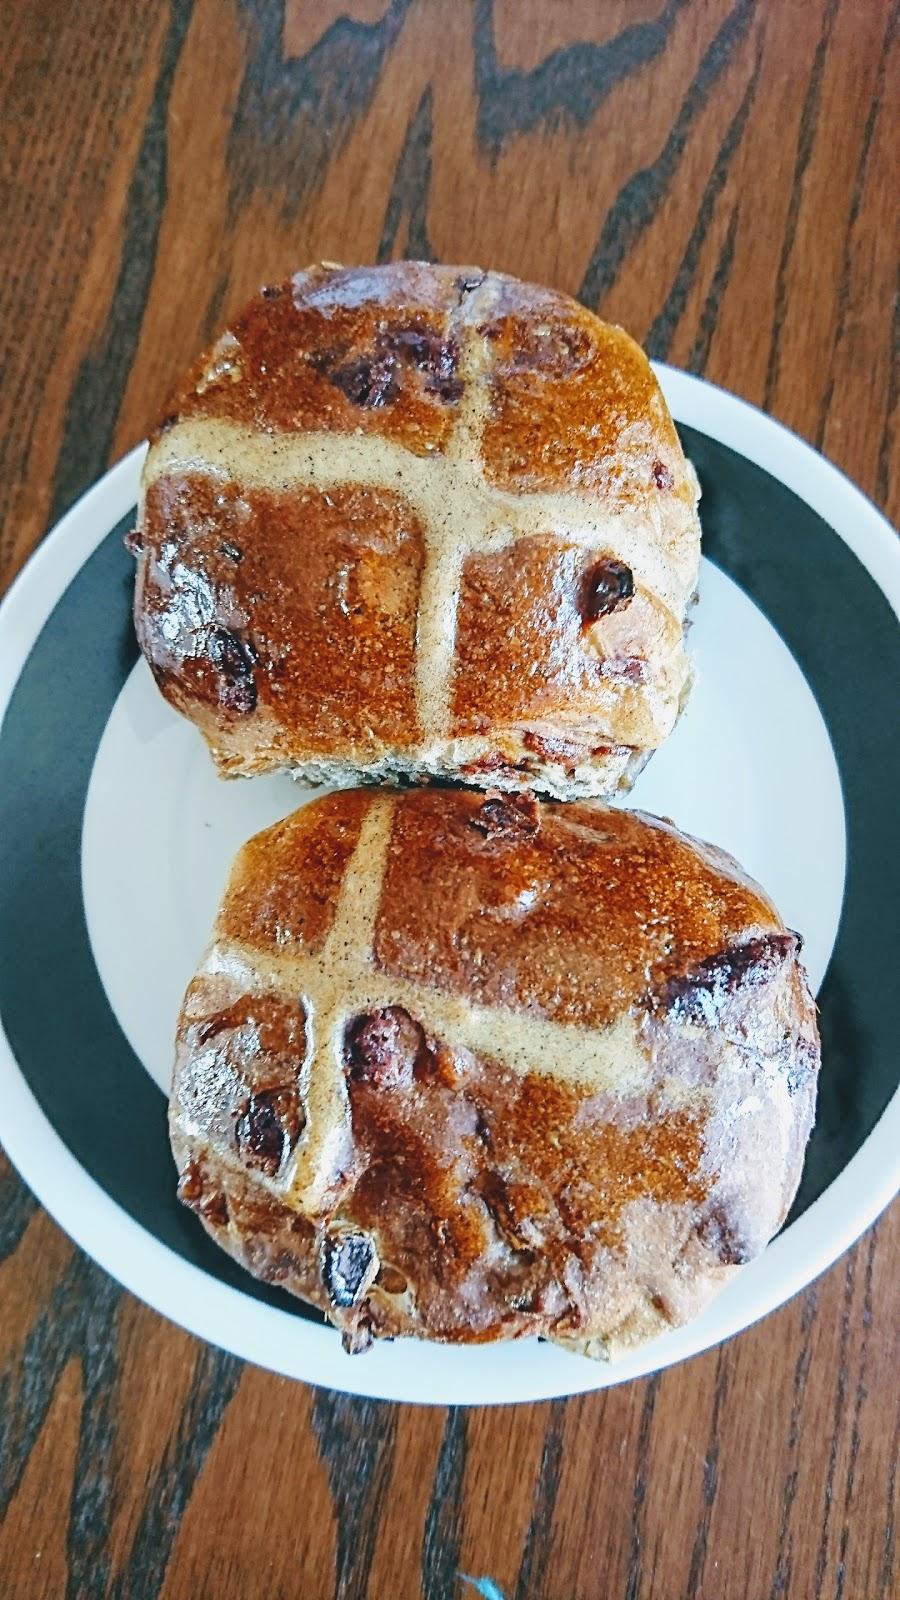 COBS Bread Bakery | bakery | 154 Brew St #340, Port Moody, BC V3H 0E7, Canada | 6044612716 OR +1 604-461-2716